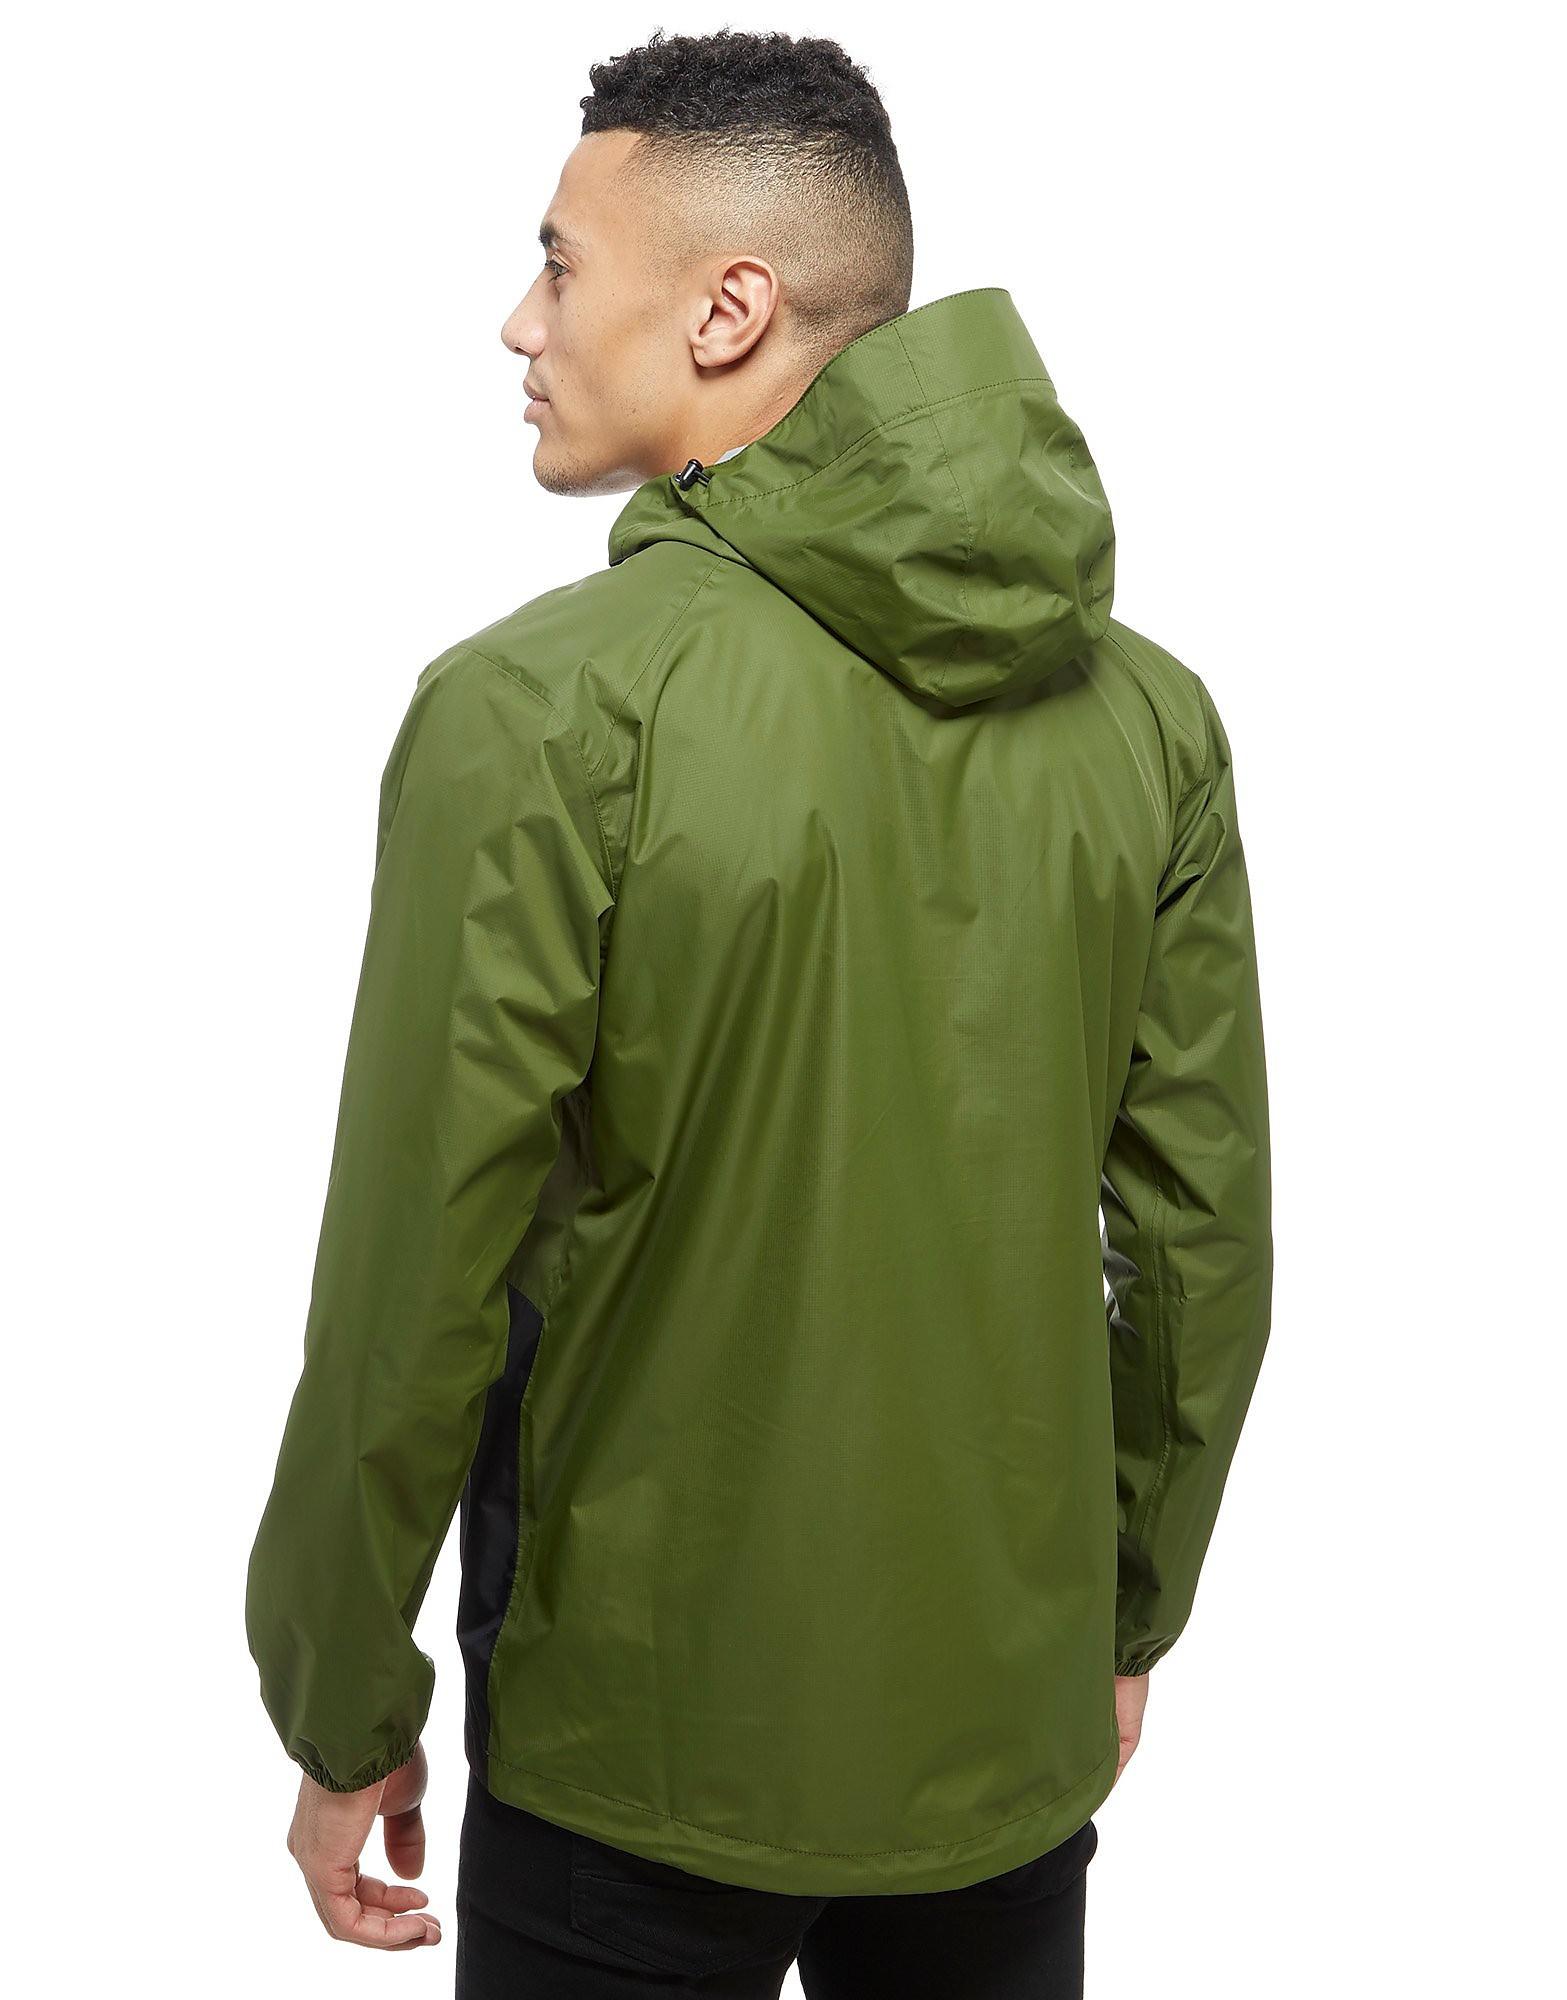 Berghaus Deluge Half Zip Waterproof Jacket